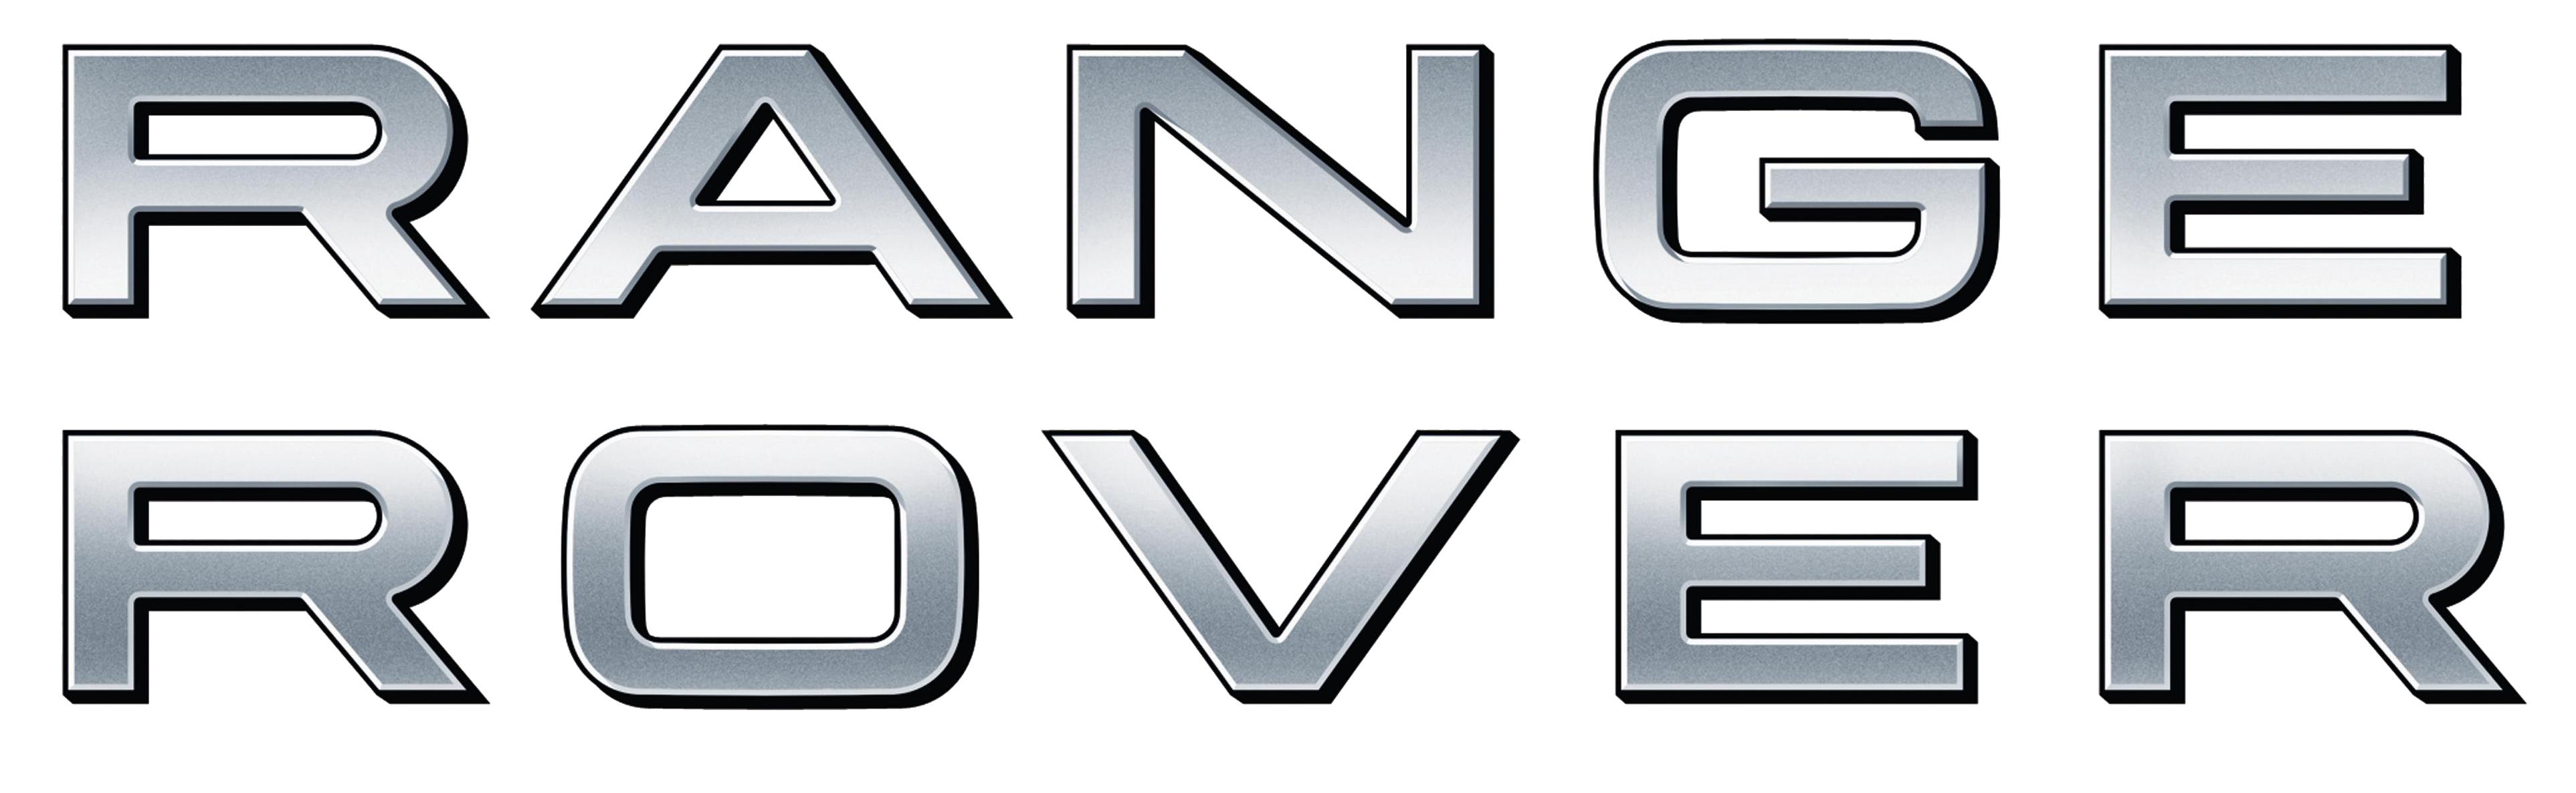 Range Rover Logo Car Wallpaper Download Range rover